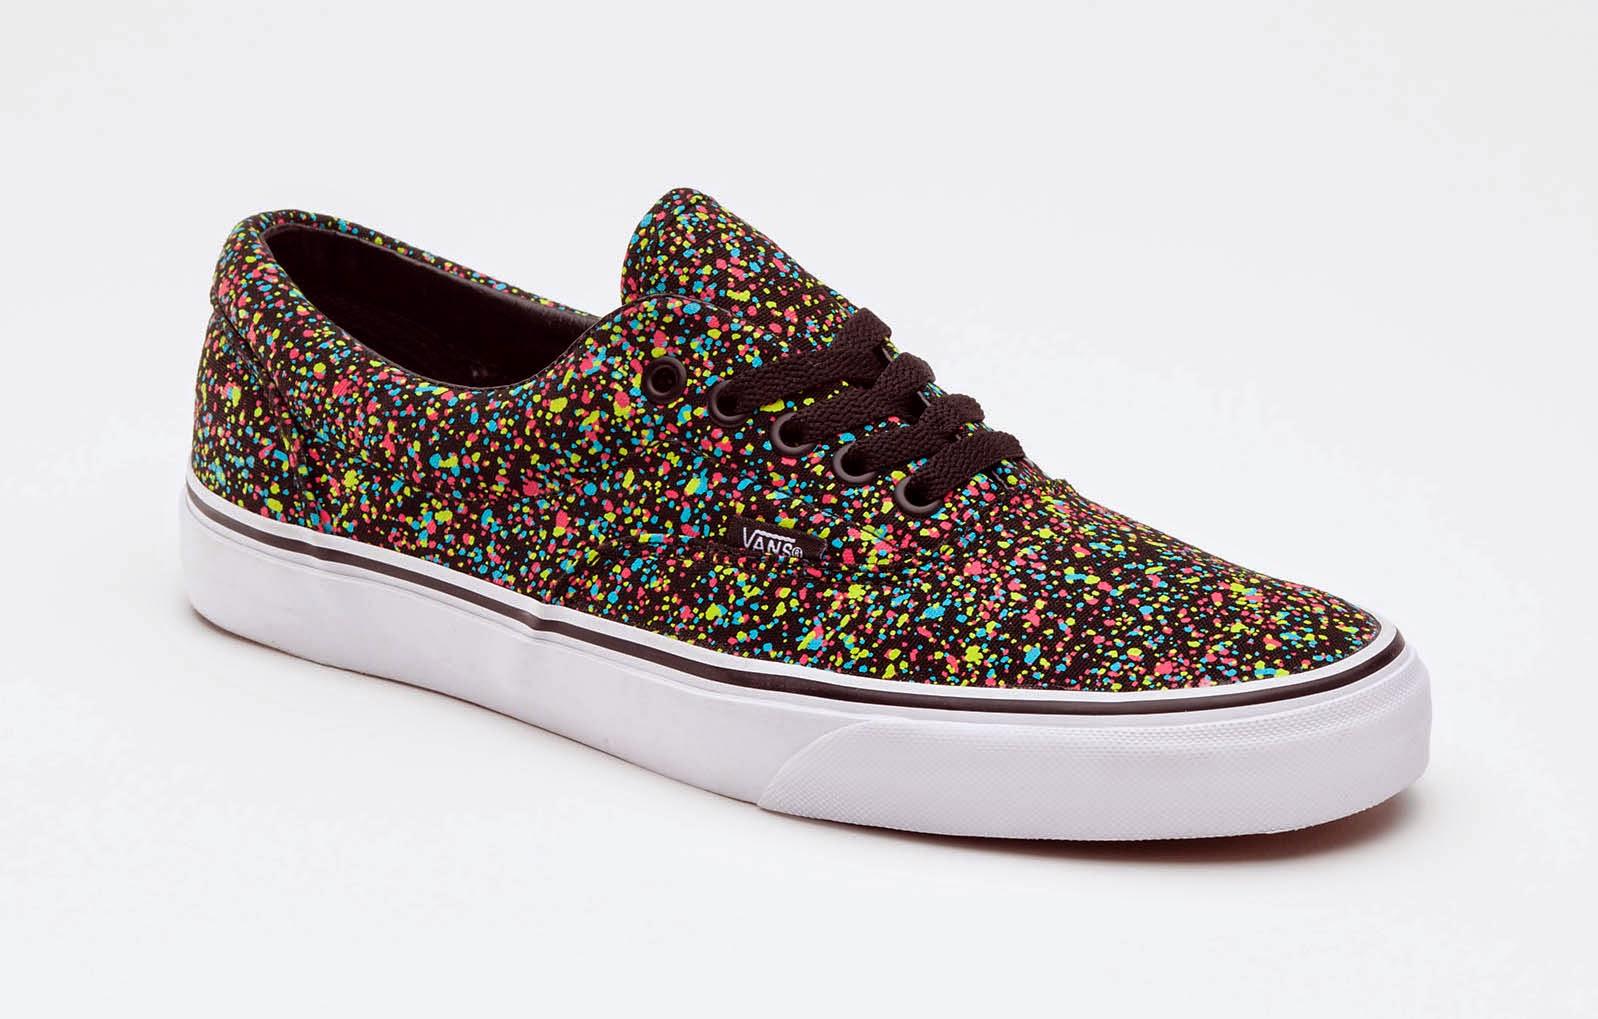 Sao Slip On Shoes